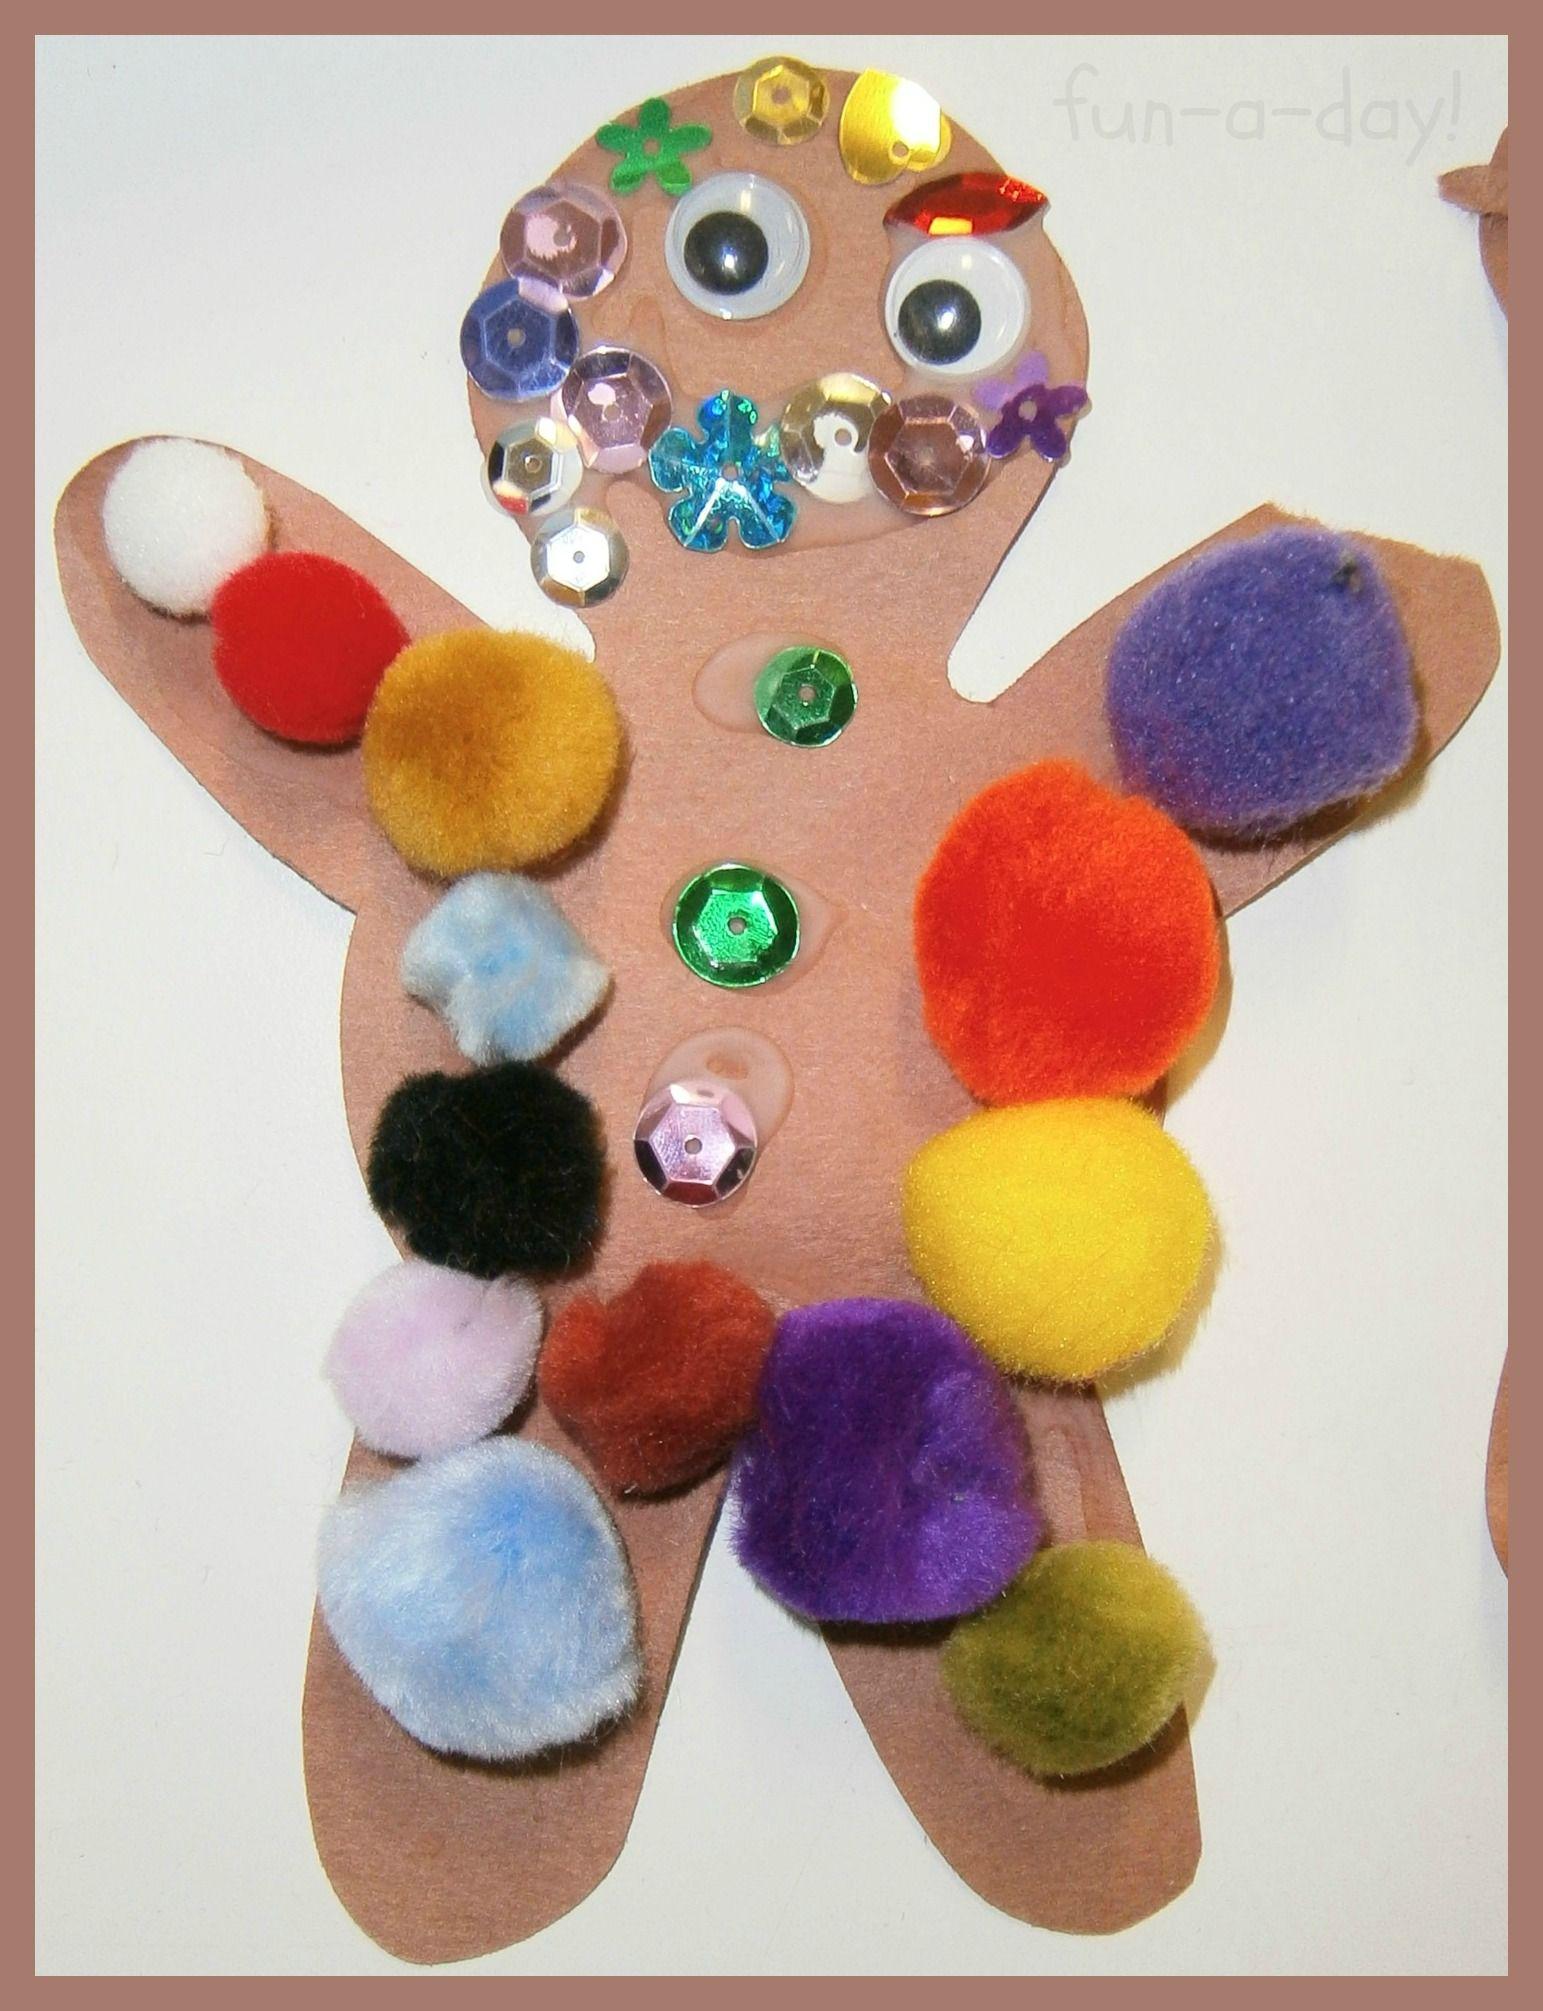 Gingerbread Man Theme For The Preschool Classroom